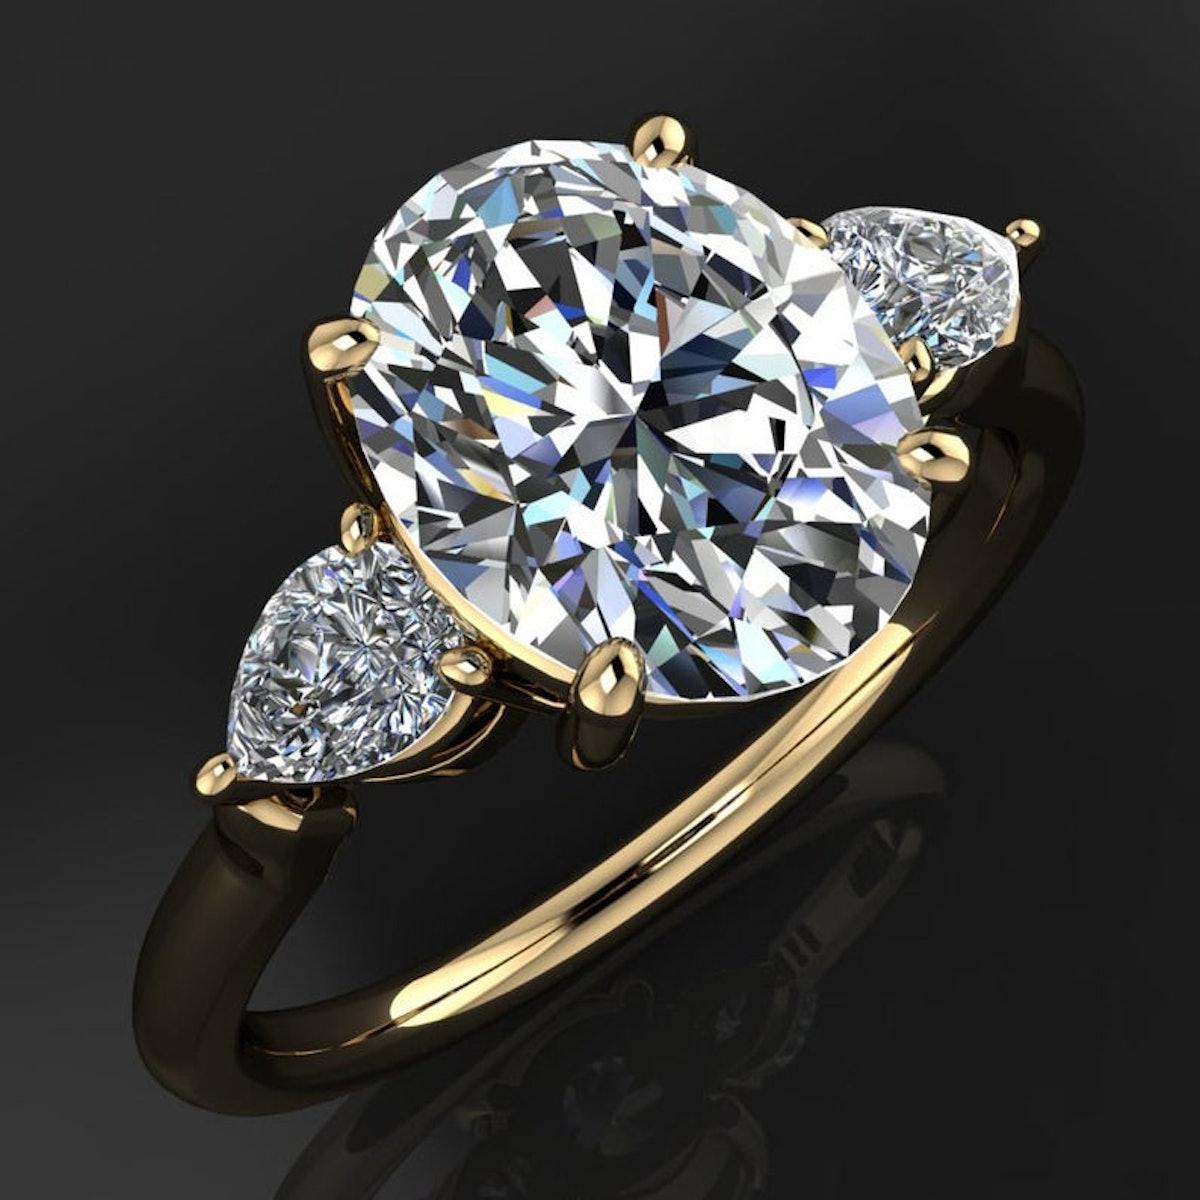 erica ring - 2 carat oval moissanite engagement ring